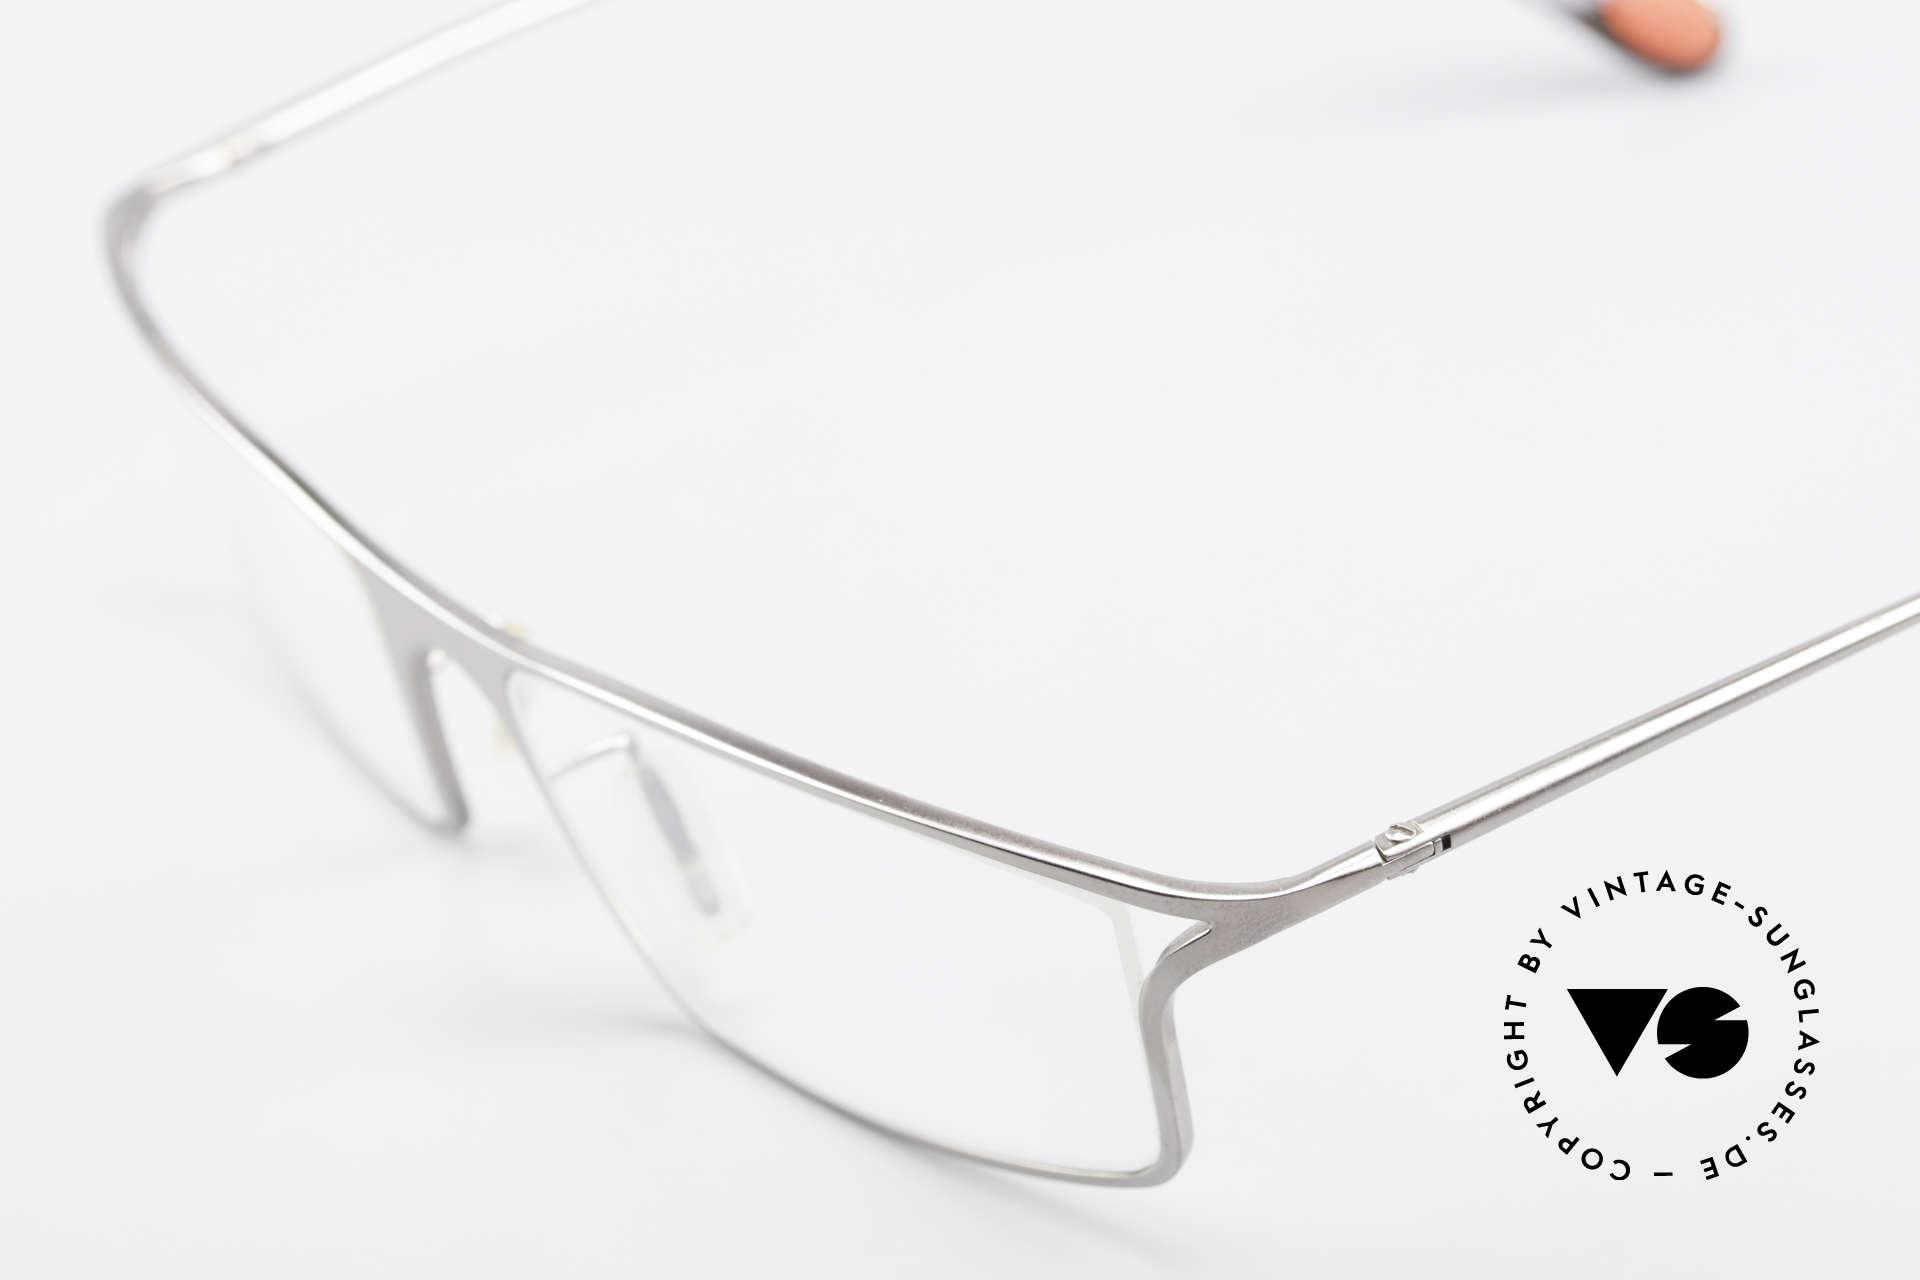 Bugatti 353 Odotype Vintage Luxury Eyeglass Frame, a 15 years old ORIGINAL in unworn condition, Made for Men